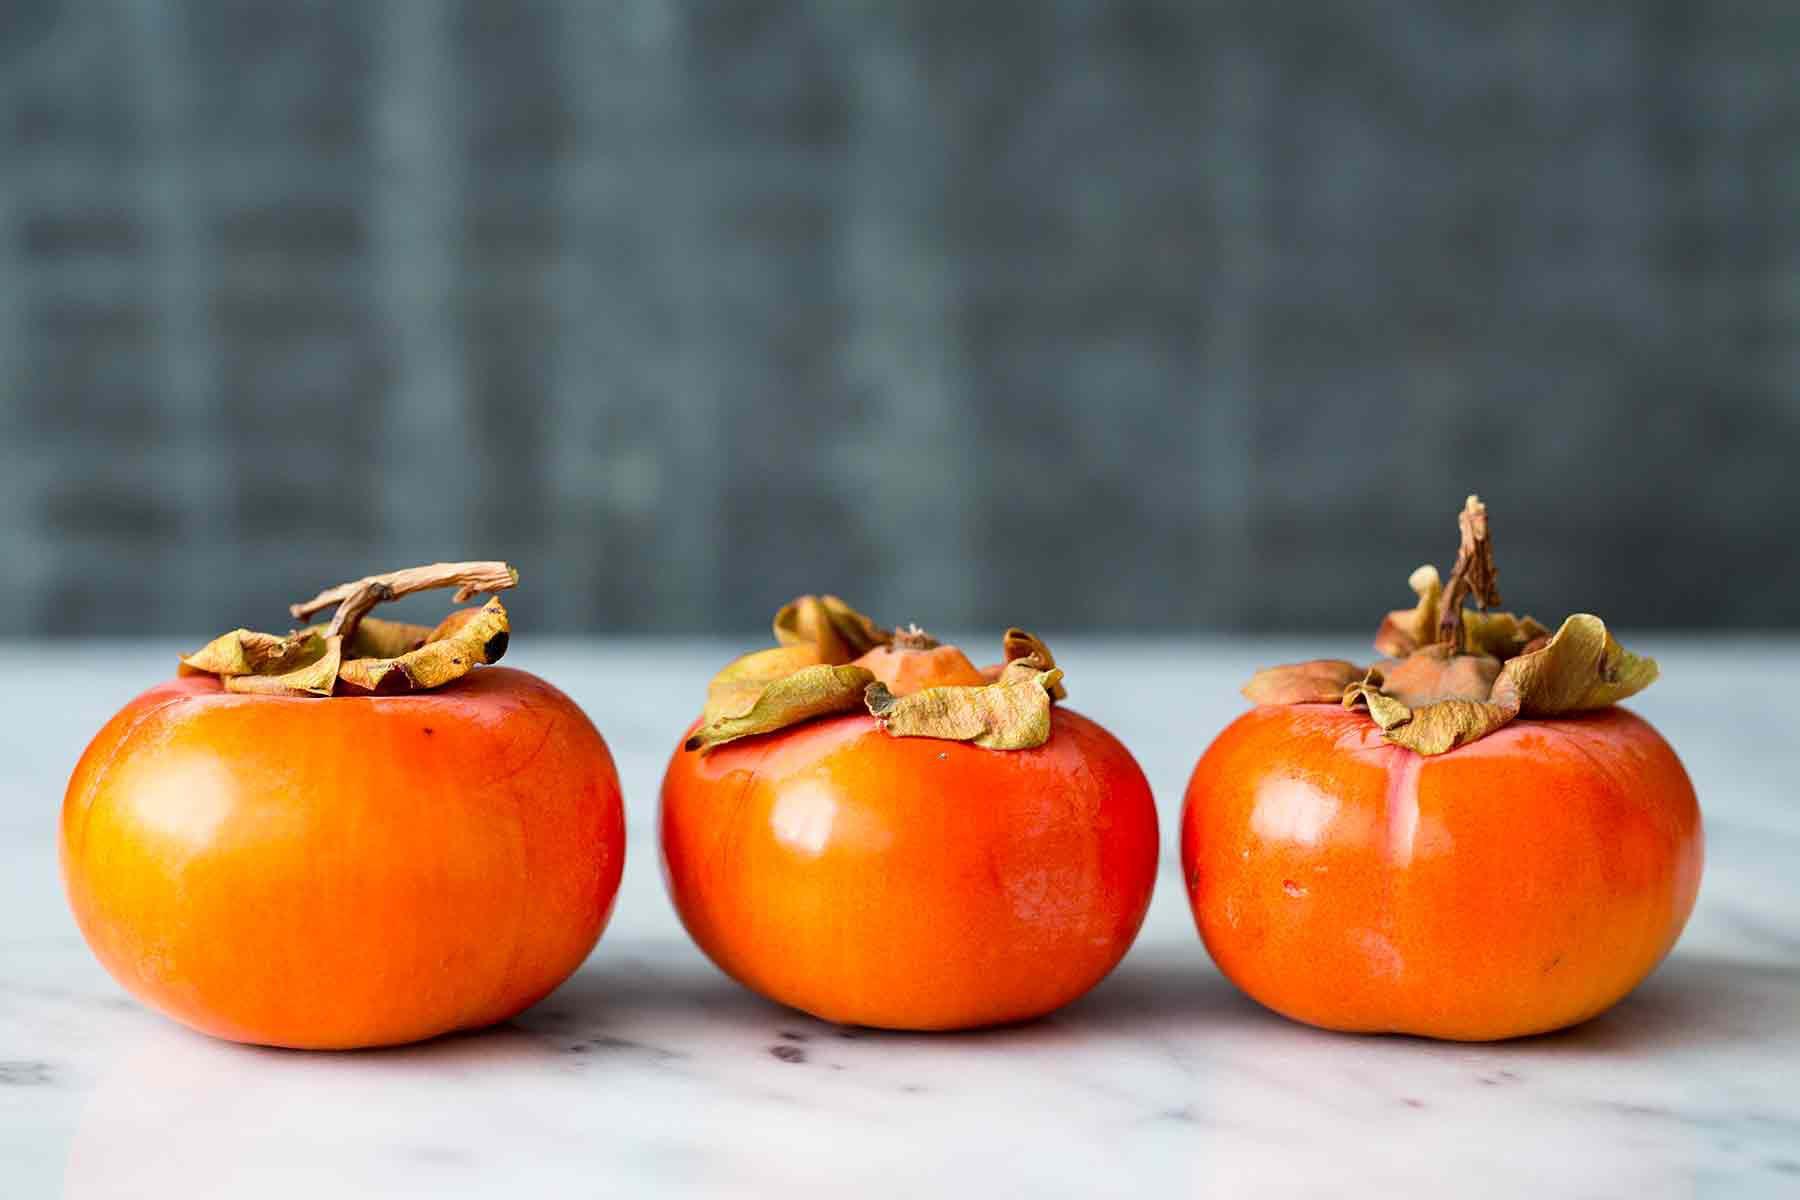 Fuyu Persimmons look like squat orange tomatoes